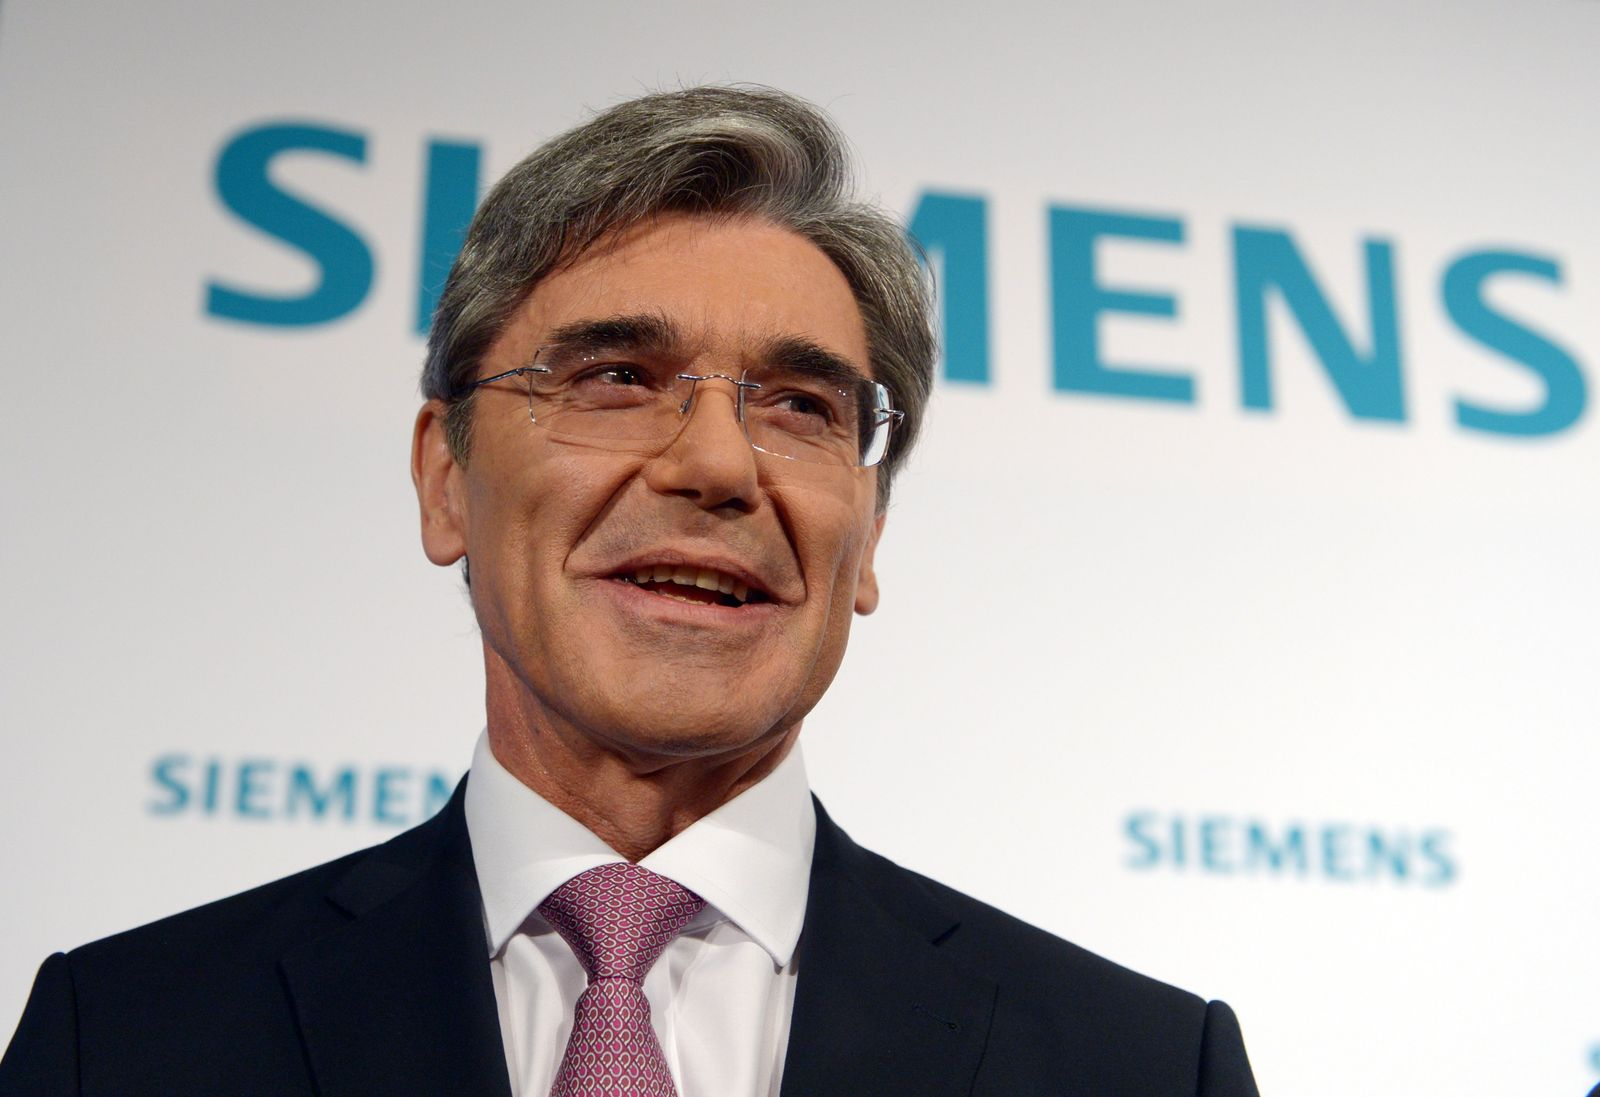 Joe Kaeser / Siemens